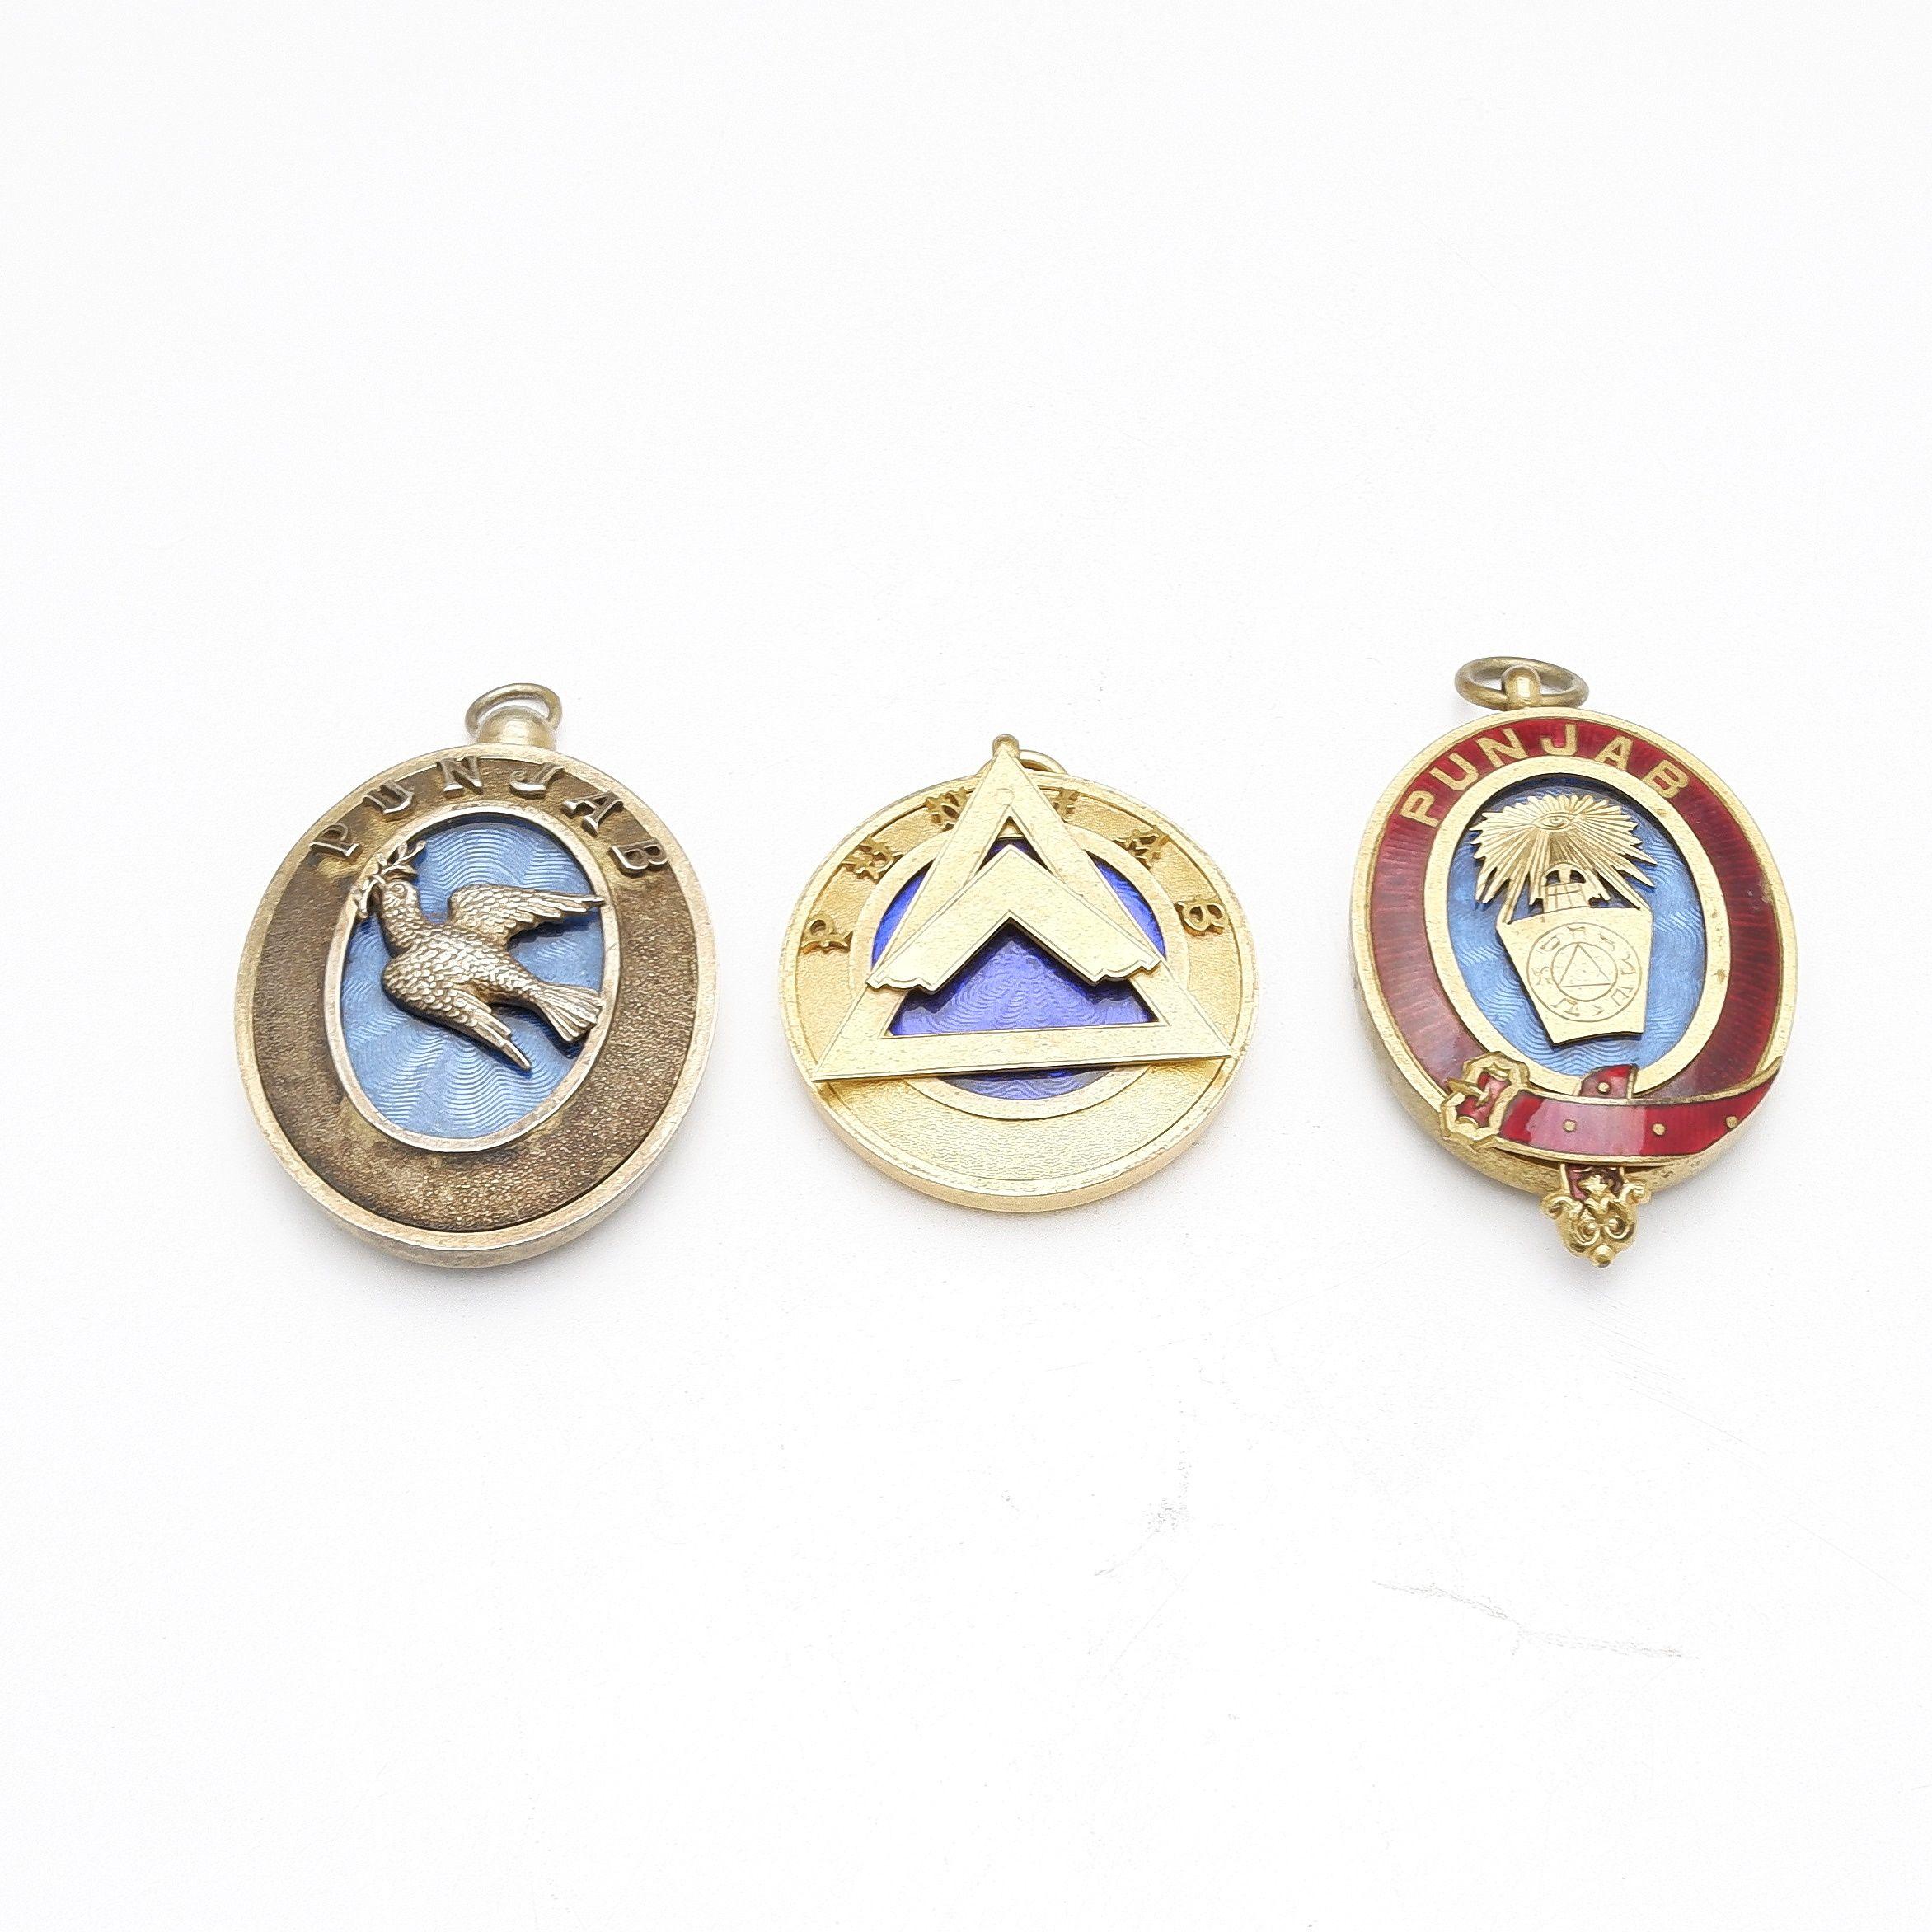 'Three Gilt and Enamel Masonic Jewels Including One Hallmaked Sterling, Punjab India'